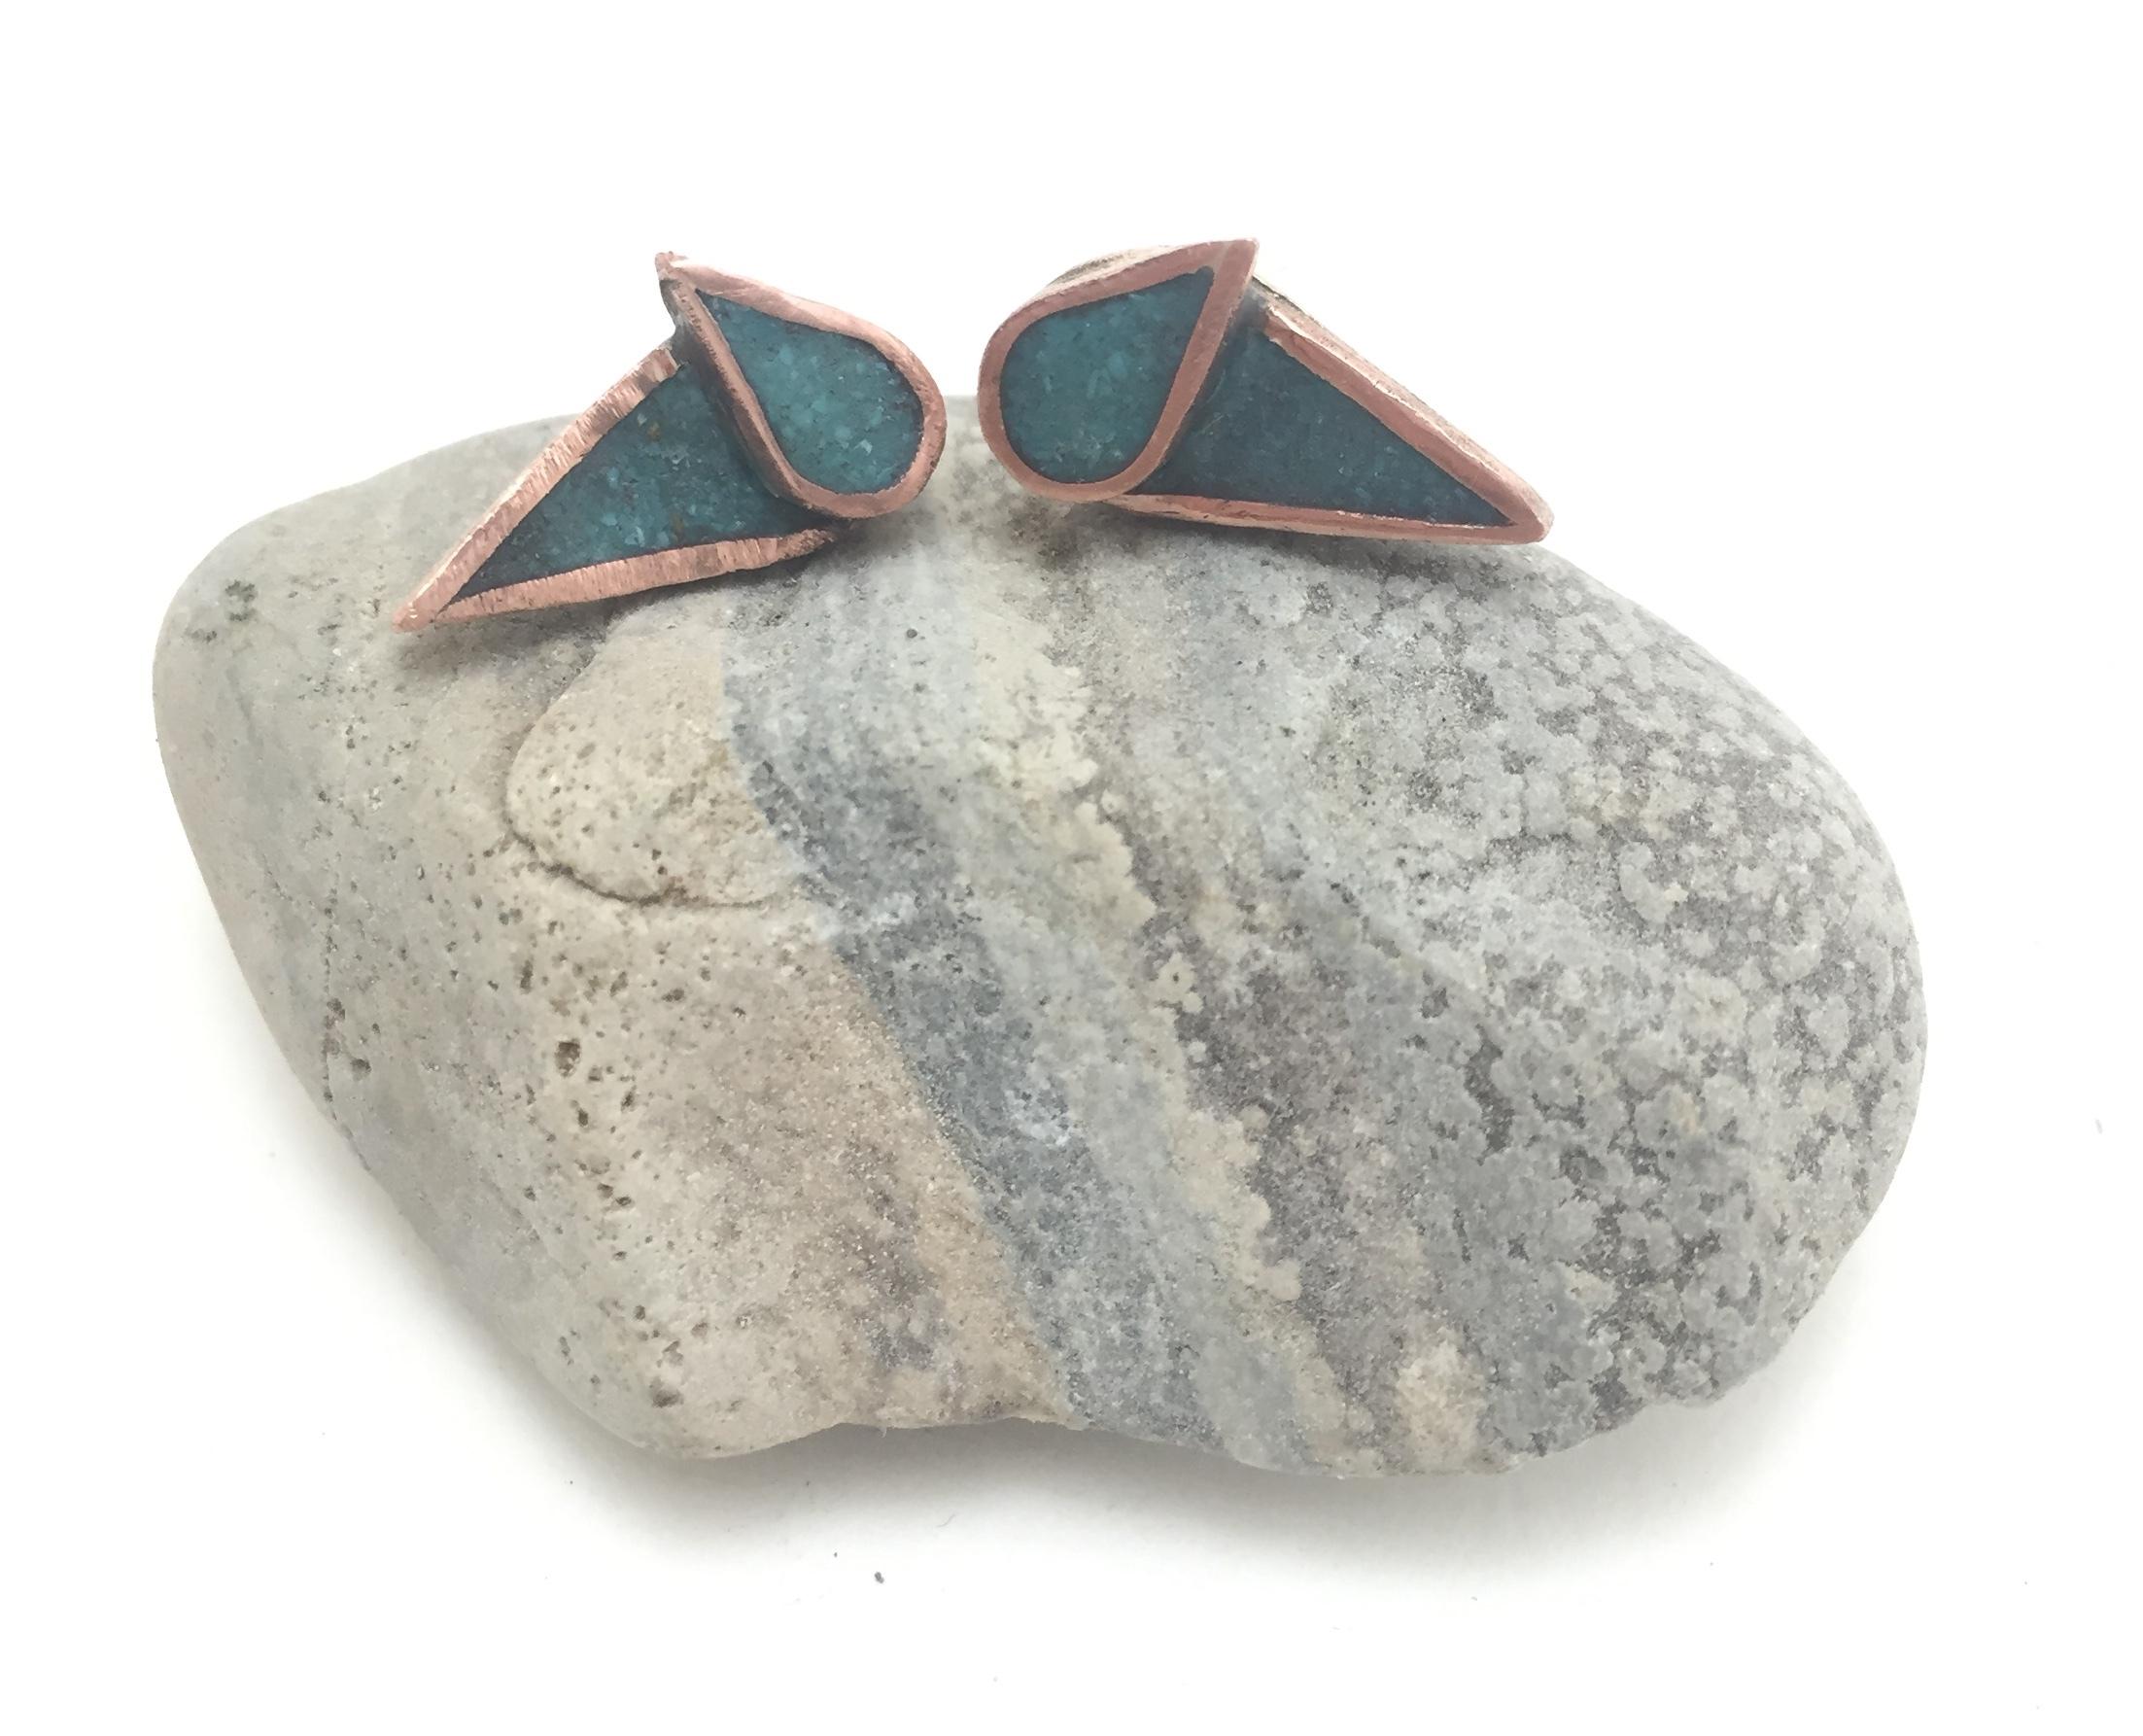 Turquoise Wild Geese Earrings